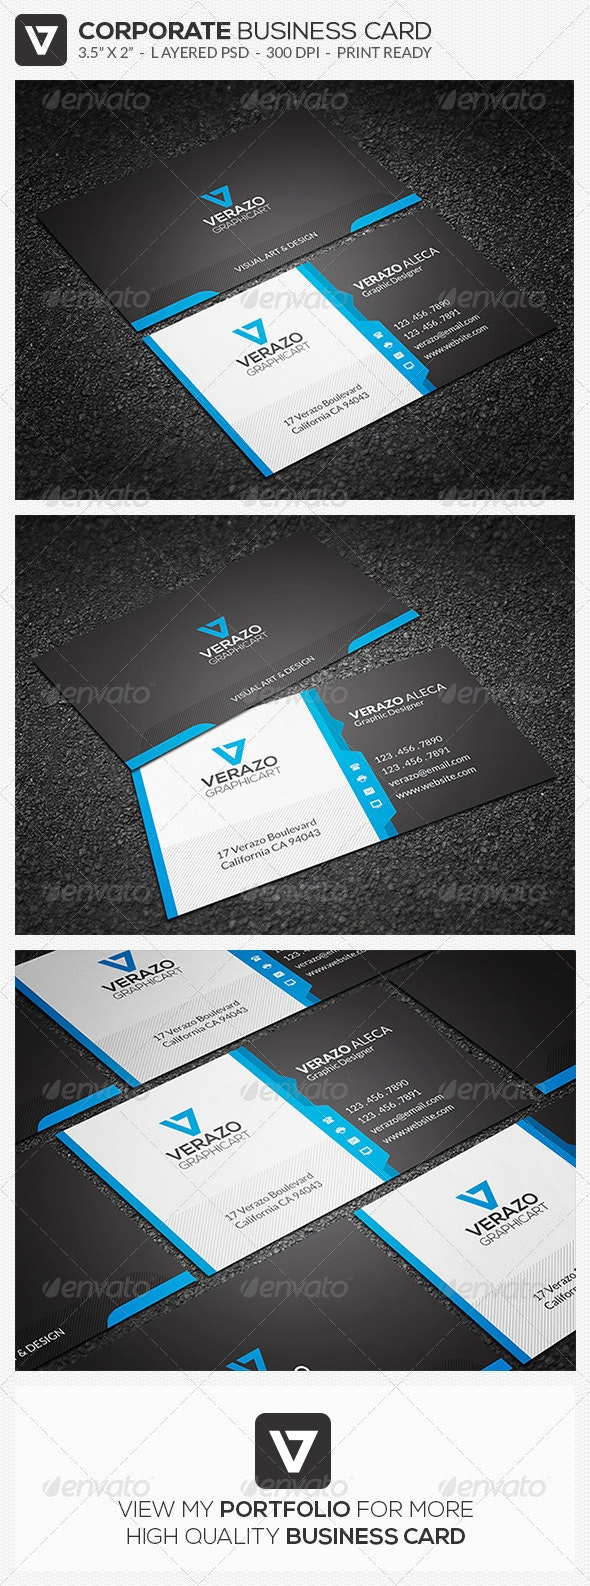 Creative Corporate Business Card 45 - Corporate Business Cards